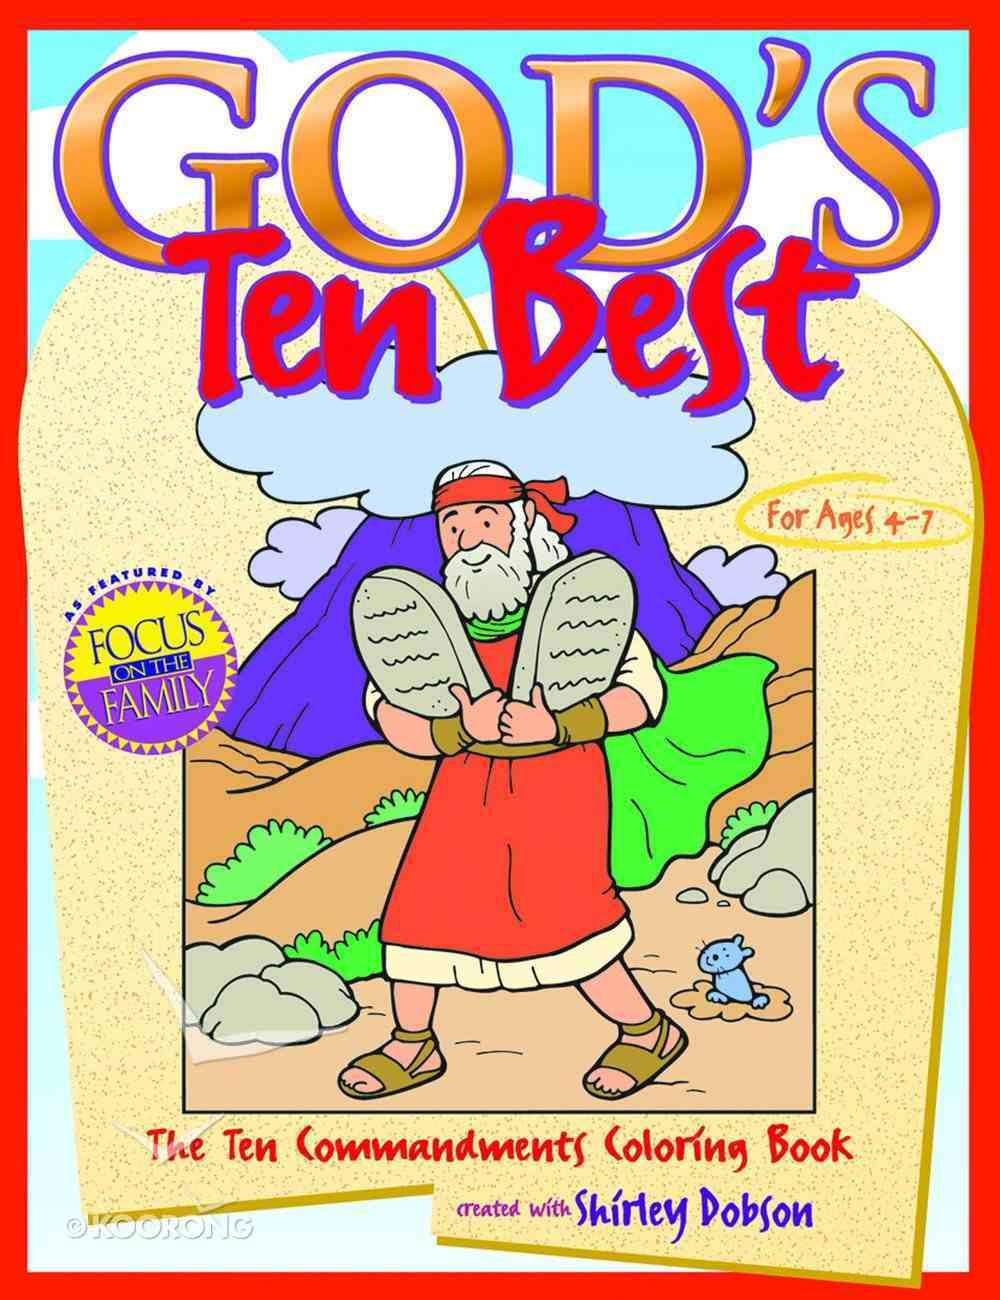 Colouring Book: God's Ten Best (God's Ten Best Series) Paperback